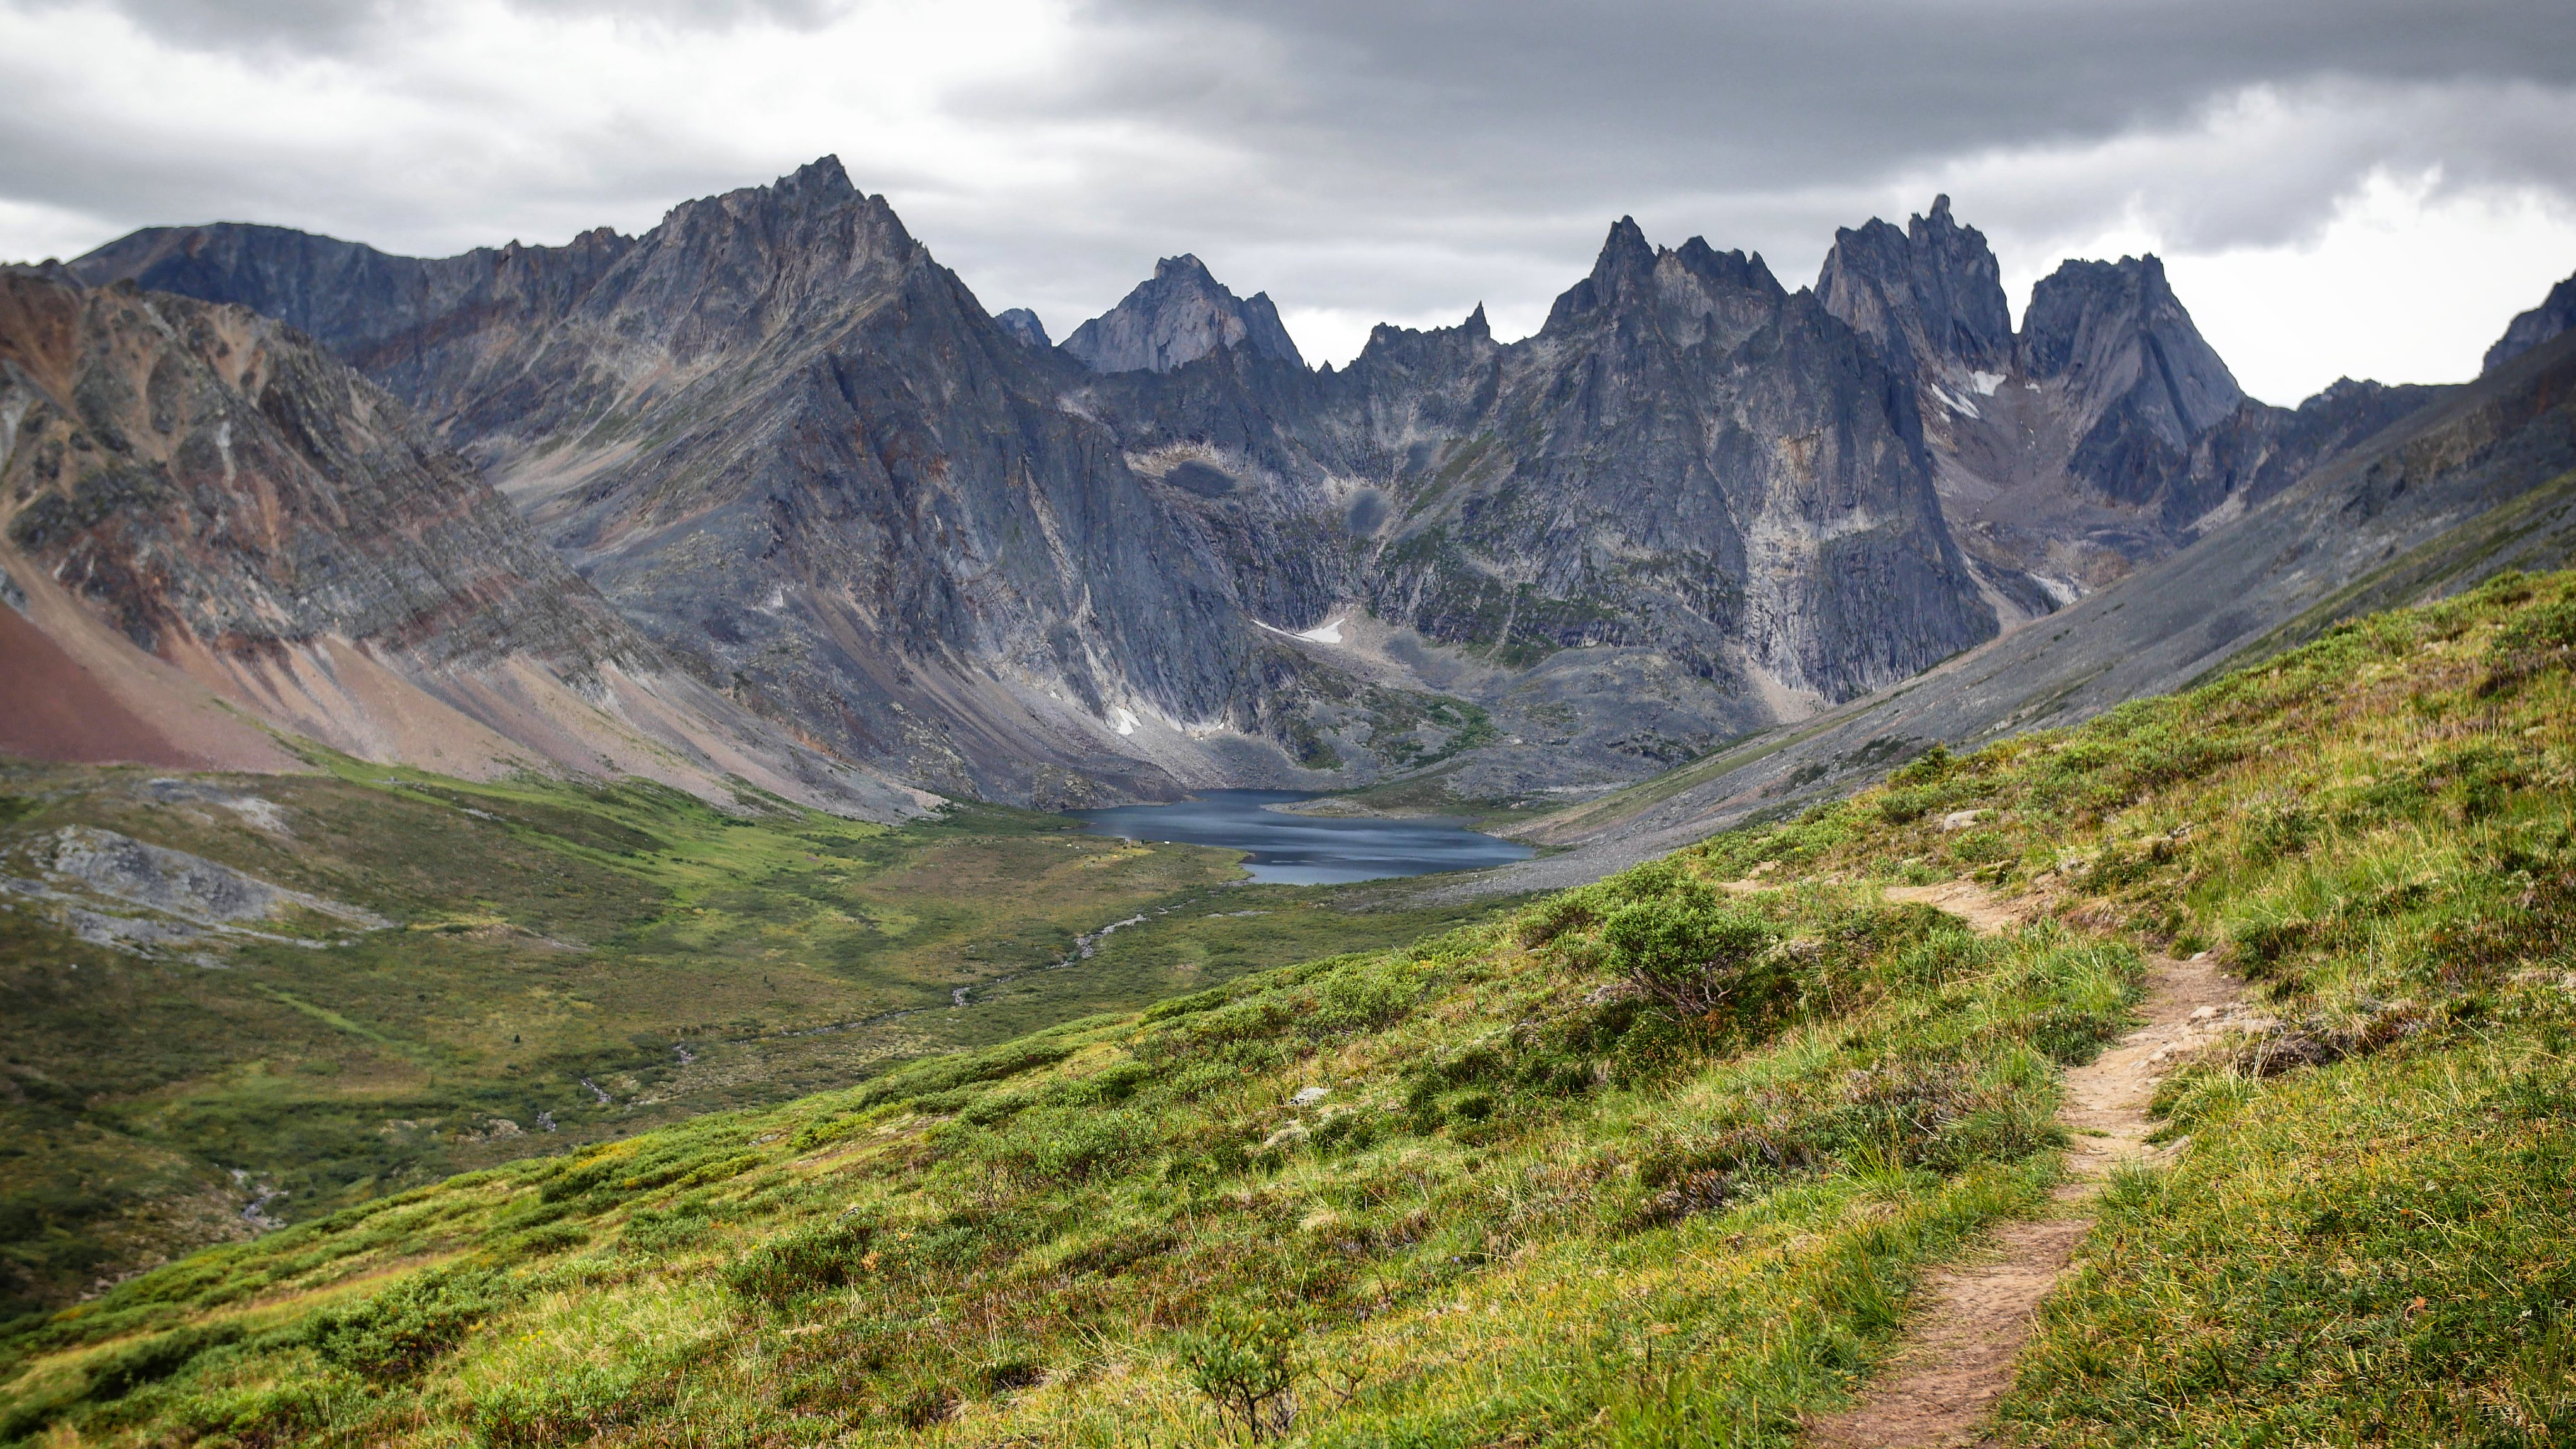 Tombstone Territorial Park, Yukon, Nick's favorite destination